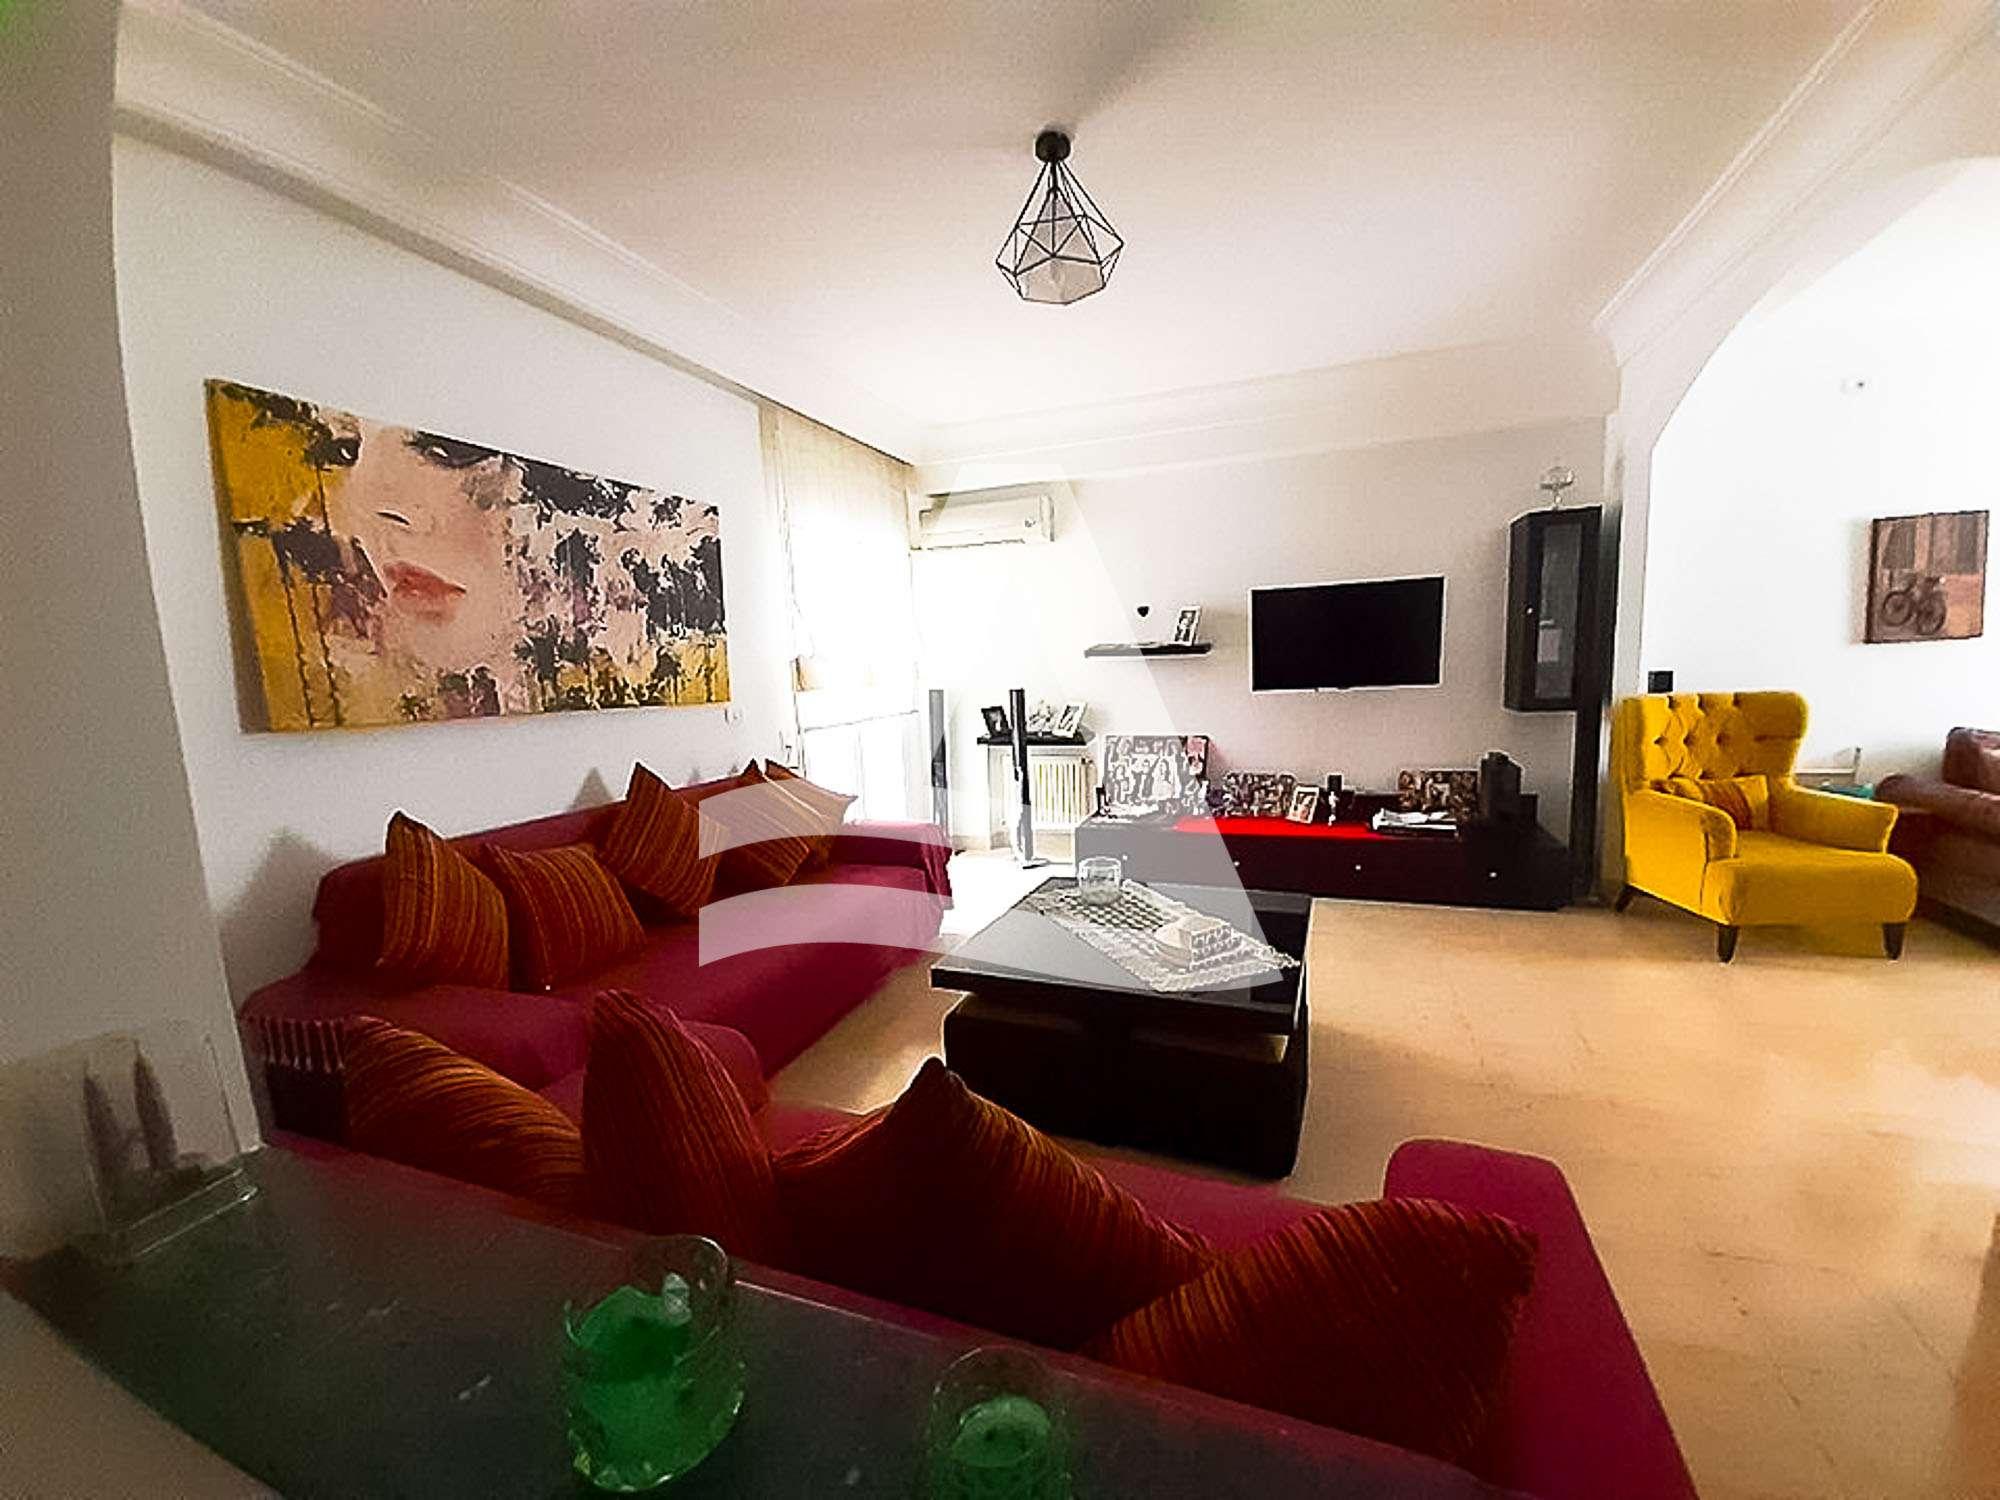 httpss3.amazonaws.comlogimoaws_Arcane_immobilière_la_Marsa-_location_-_vente_la_marsa_13_sur_16_1574071698444-1